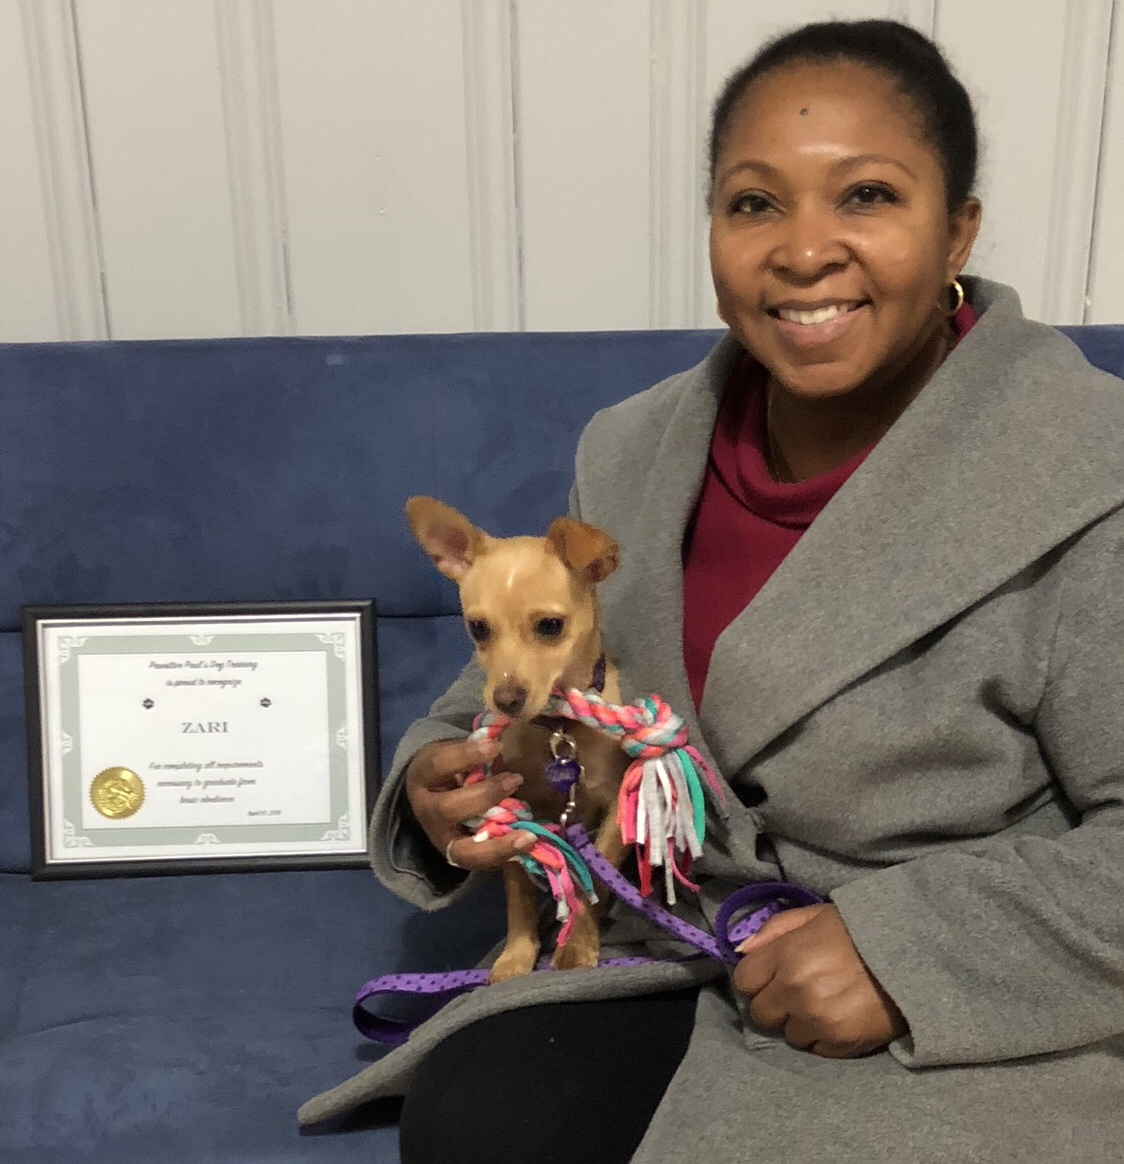 Zari's Graduation